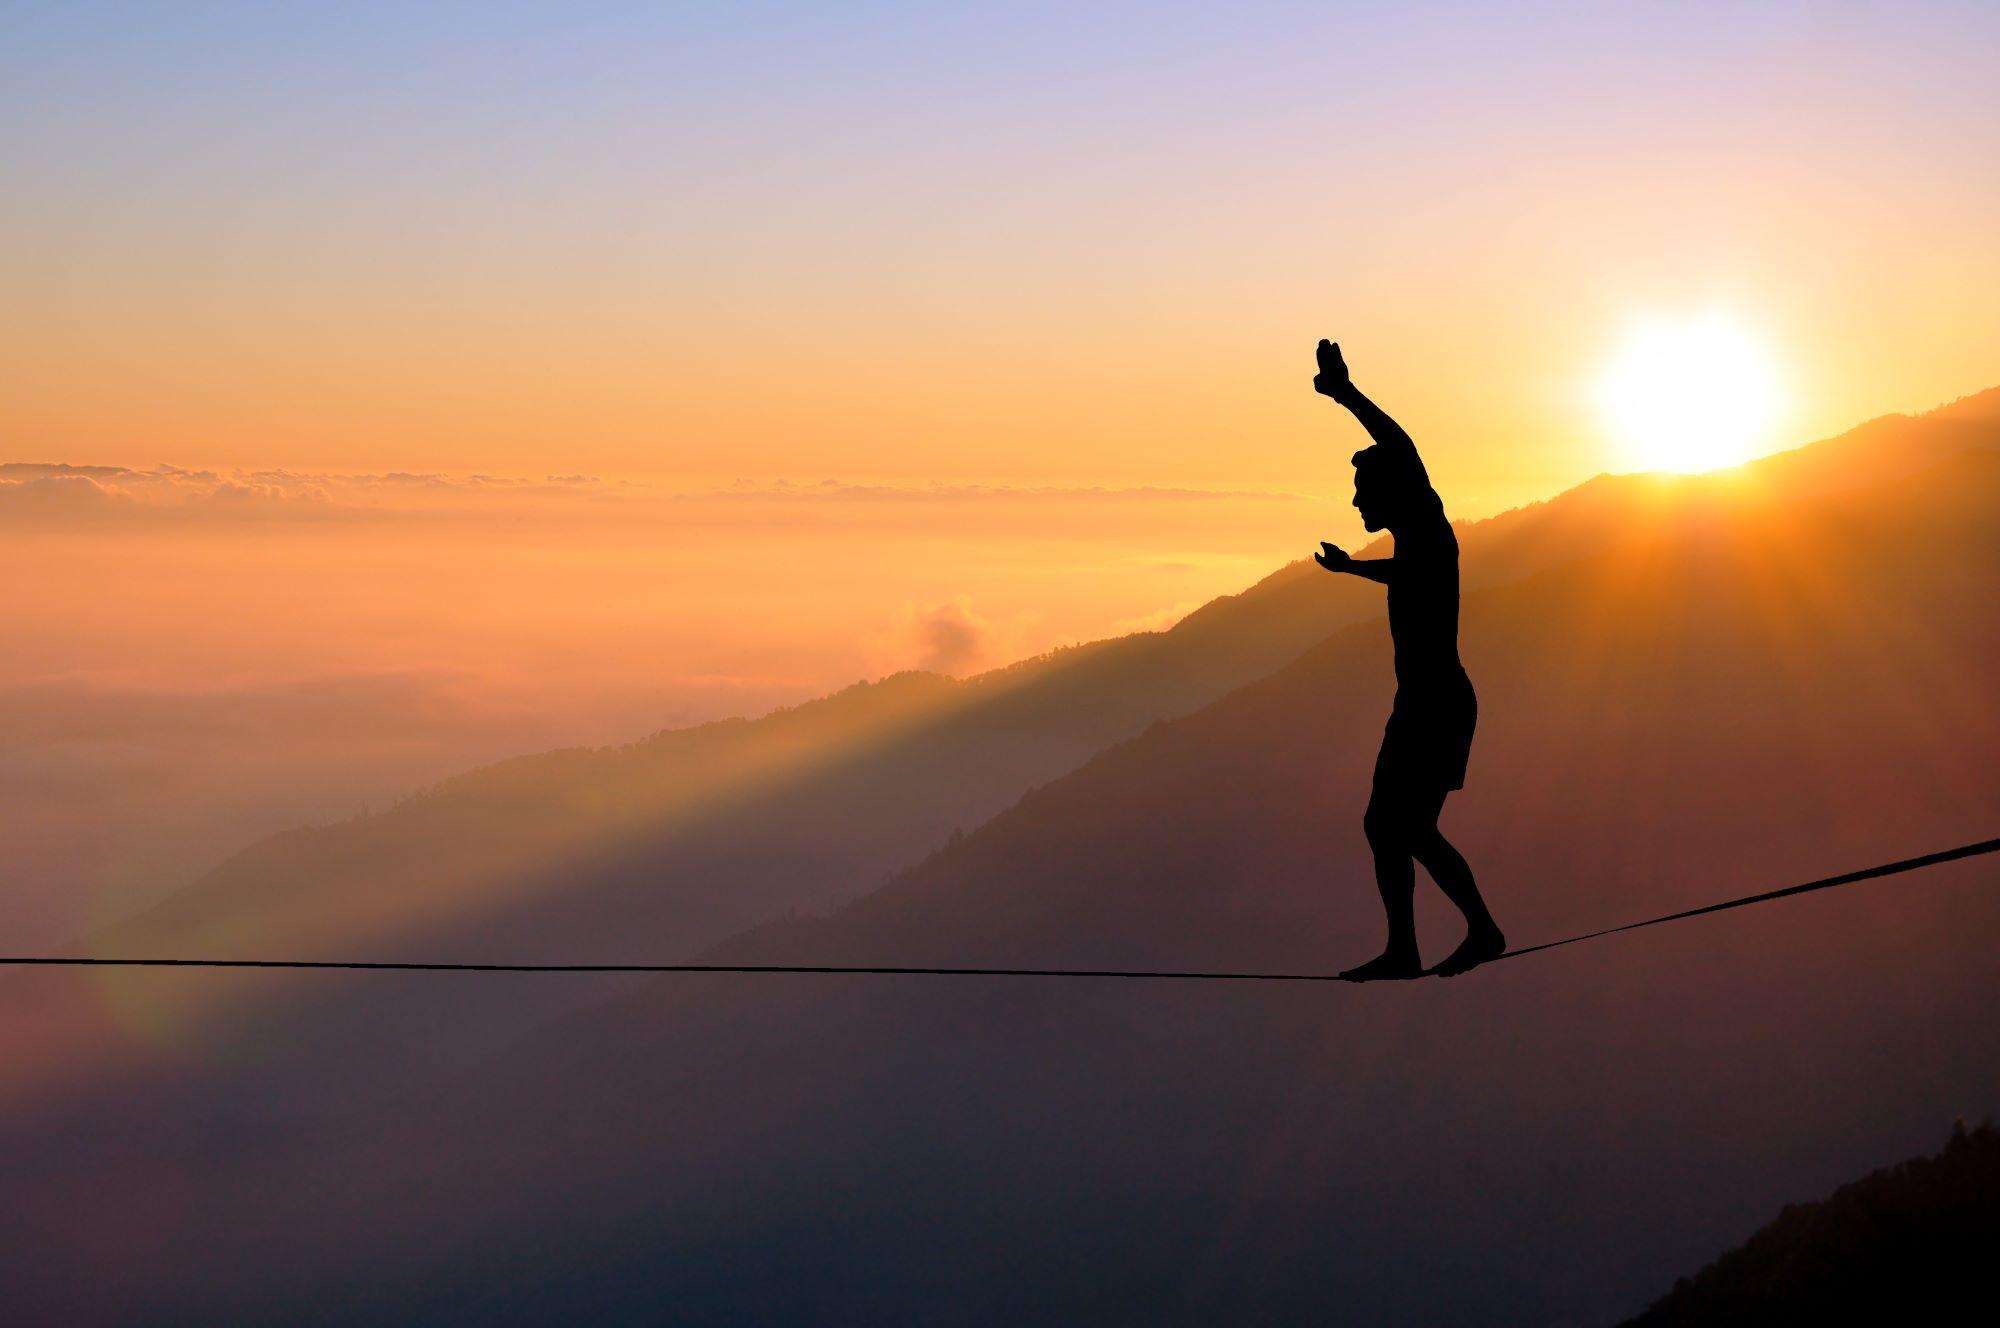 Man walking tightrope above a ravine at sunset